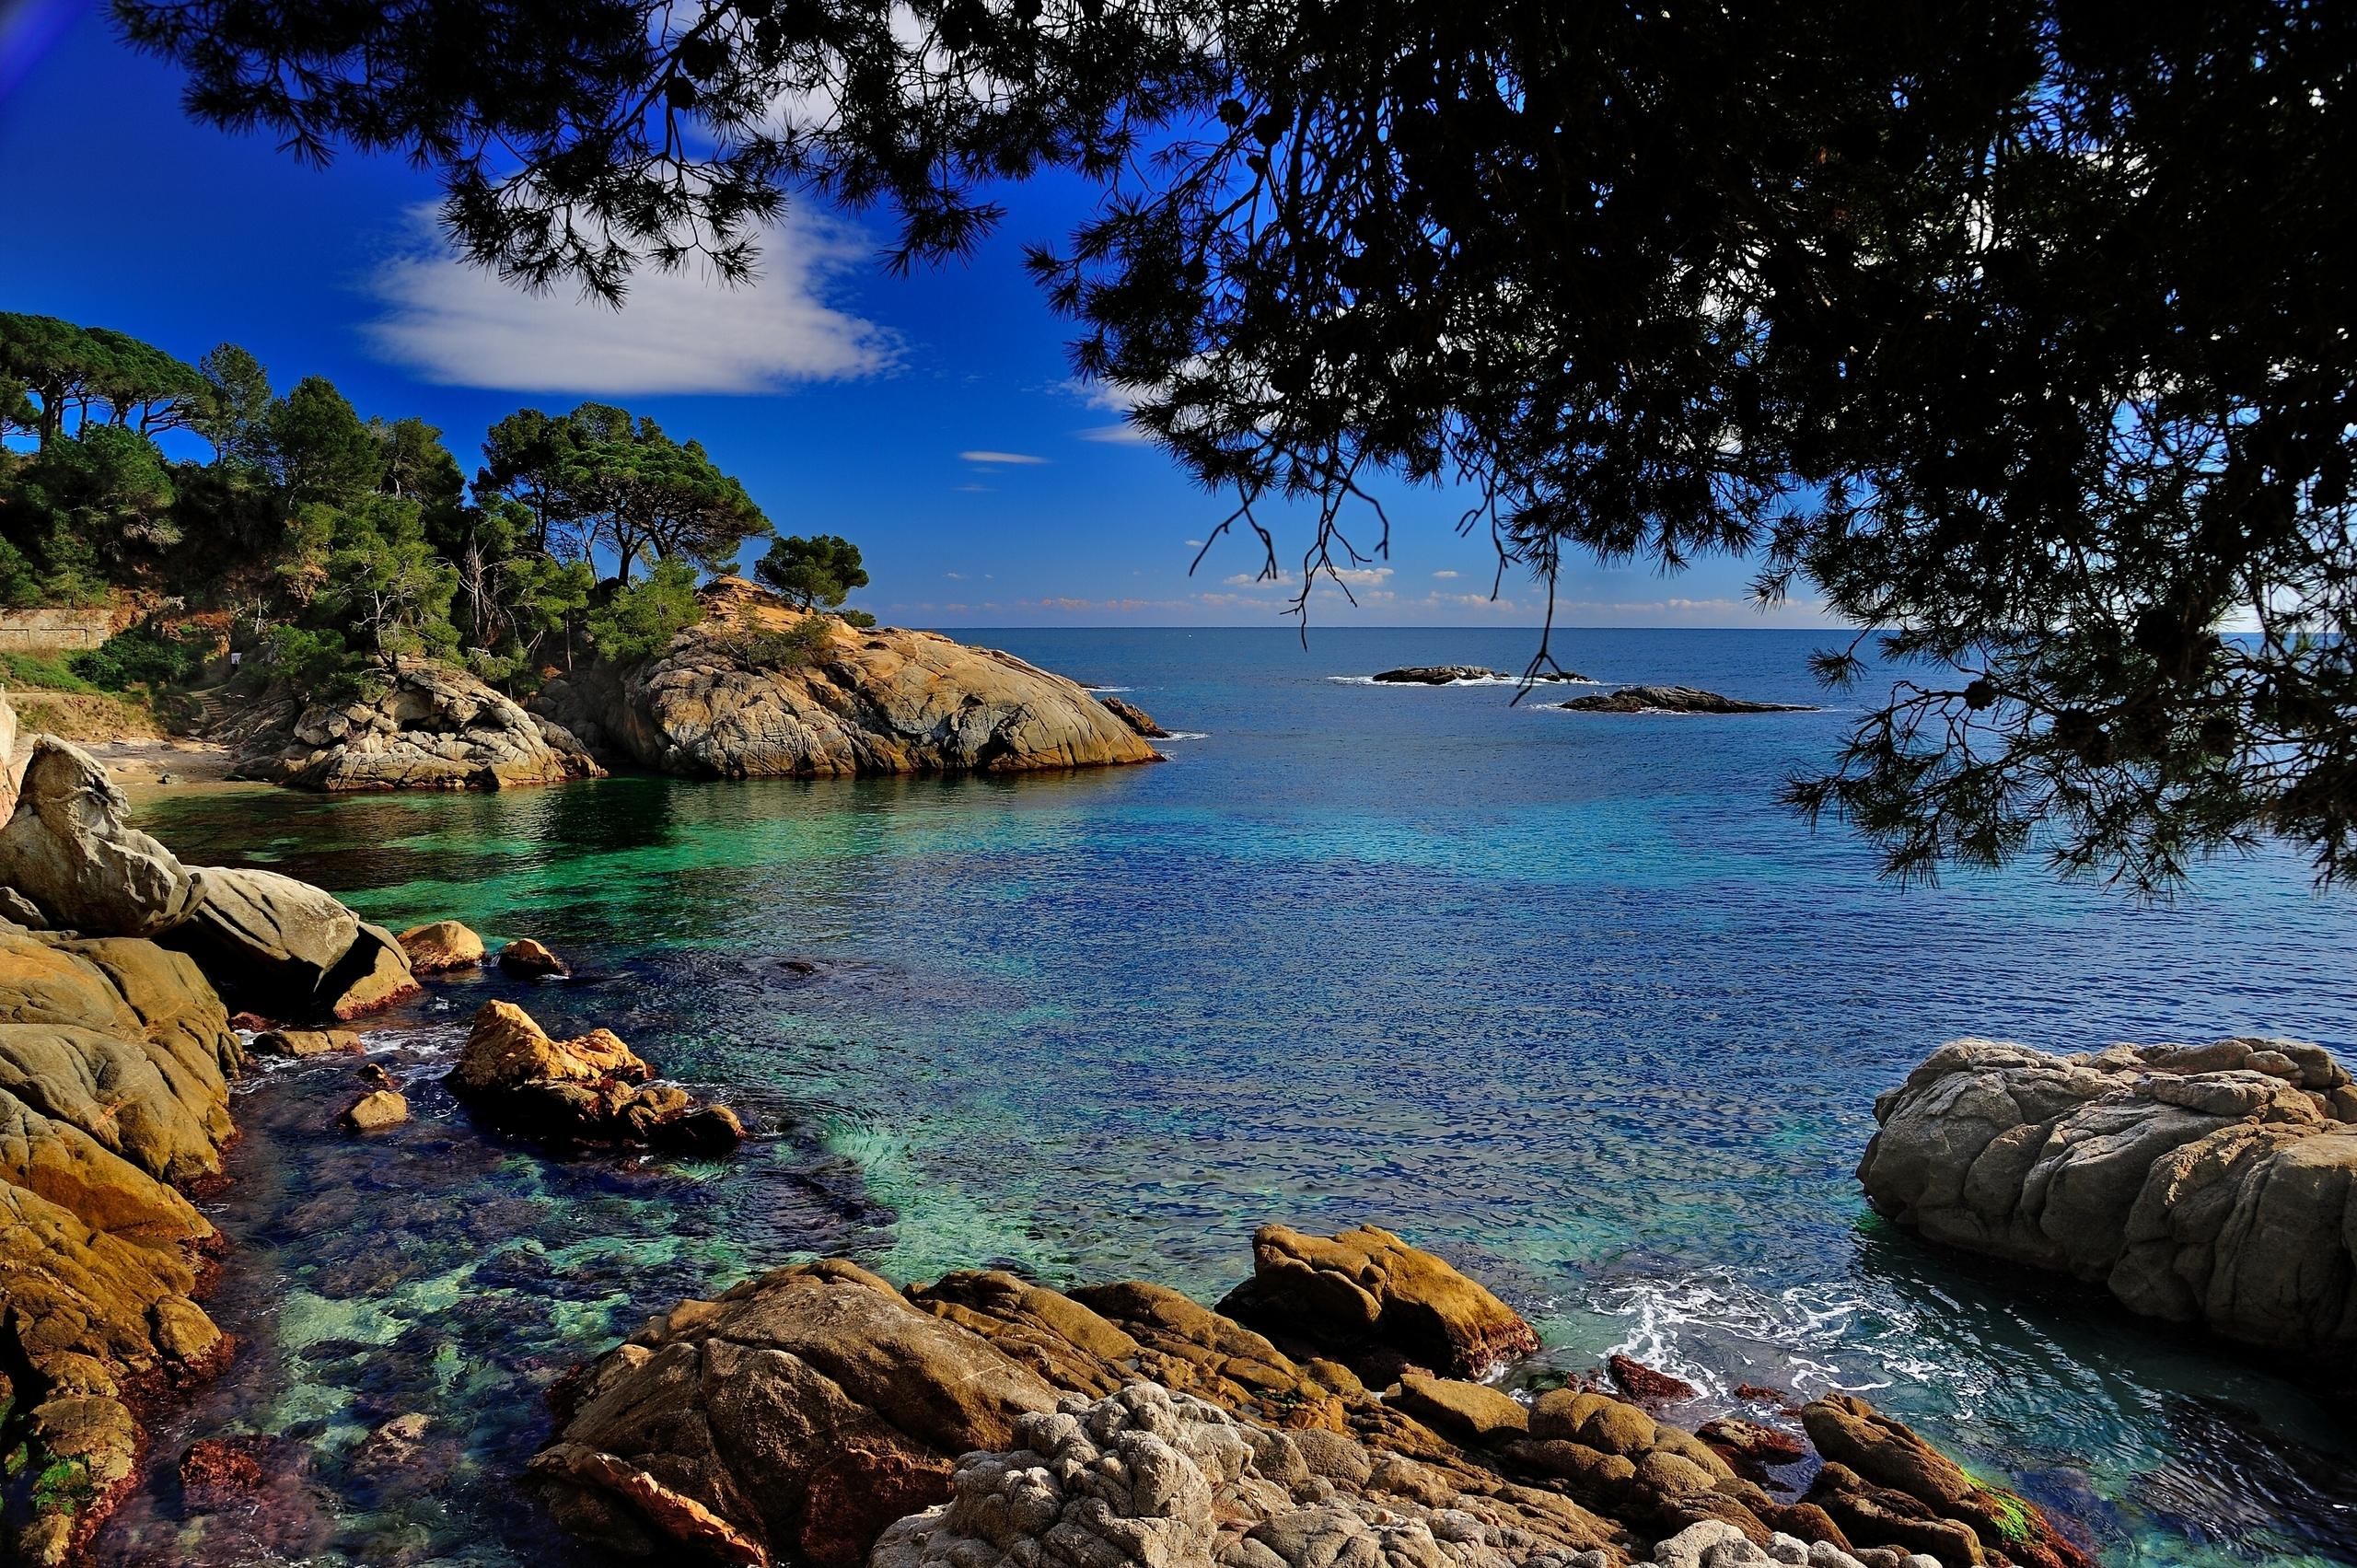 Фотопанорама пейзажей средиземноморского побережья